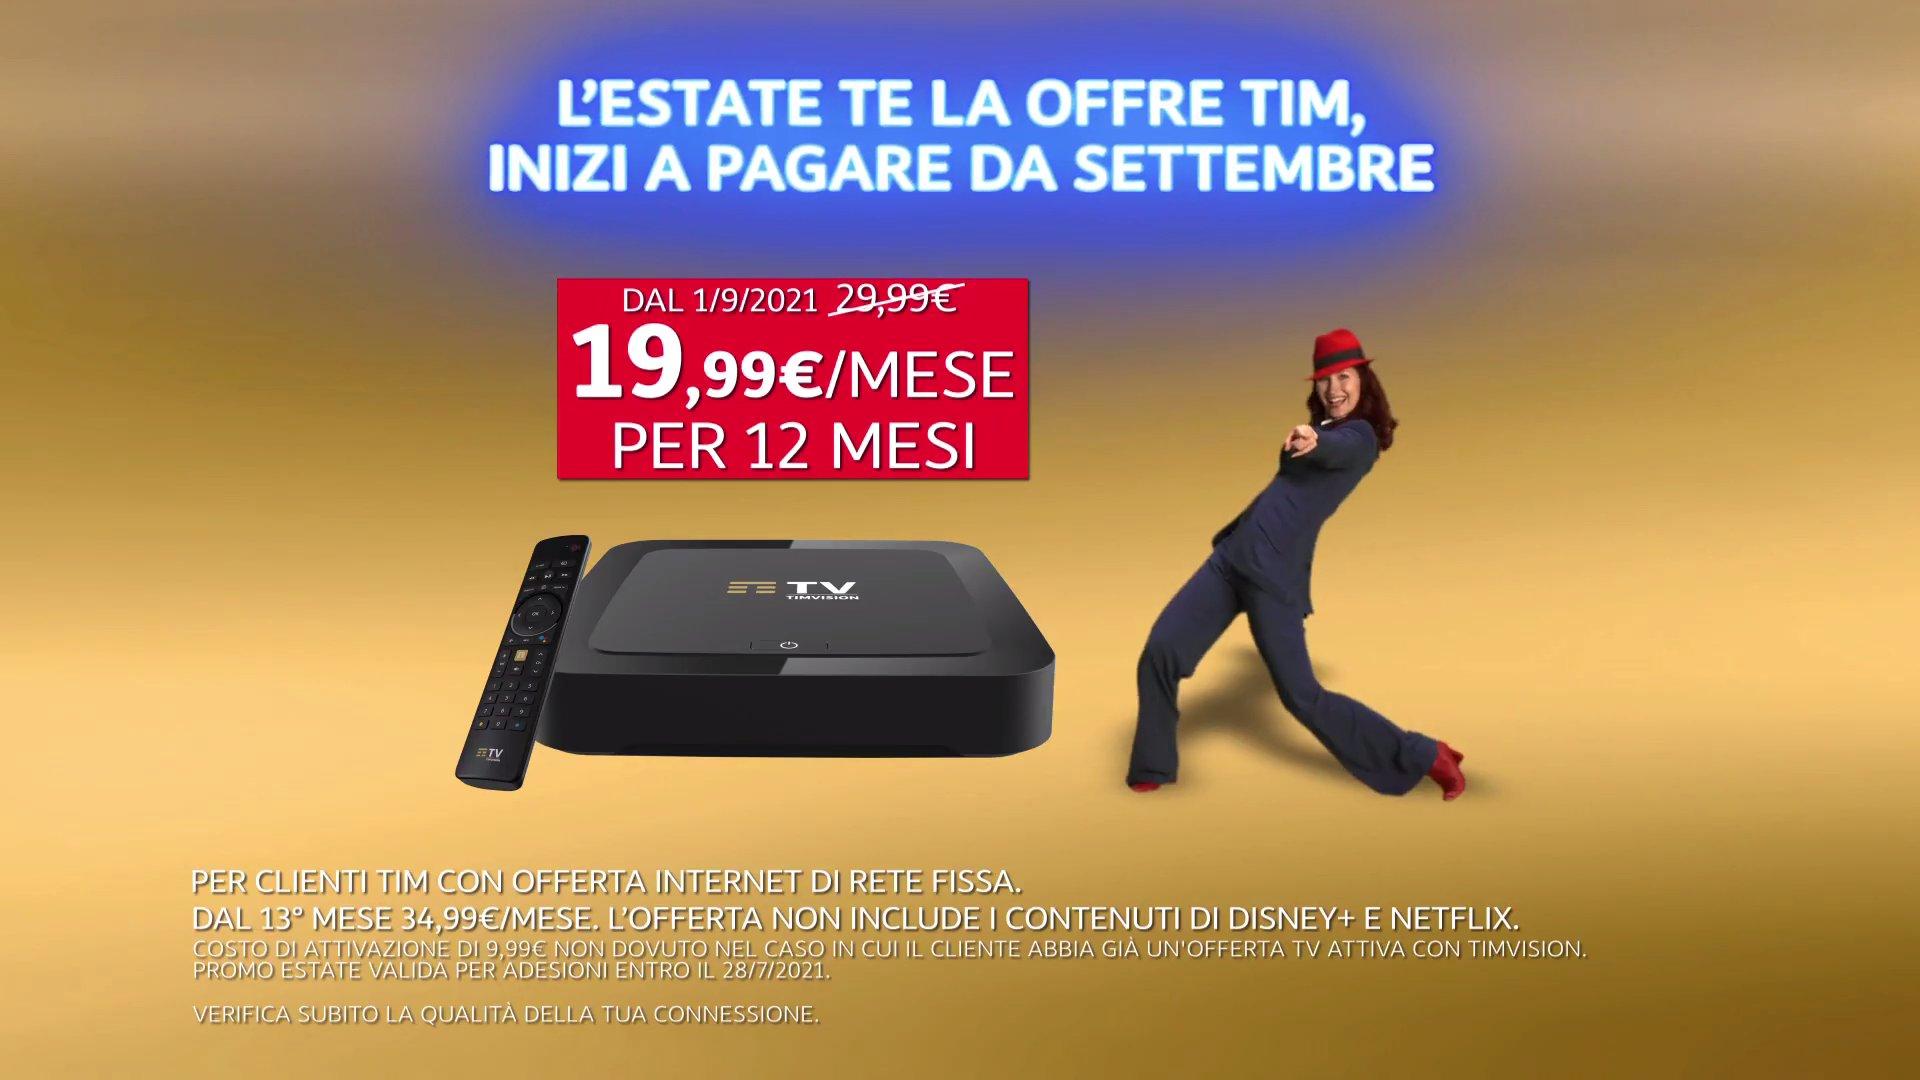 TimVision svela offerte Calcio con DAZN, Discovery+, Infinity+, Disney+, Netflix